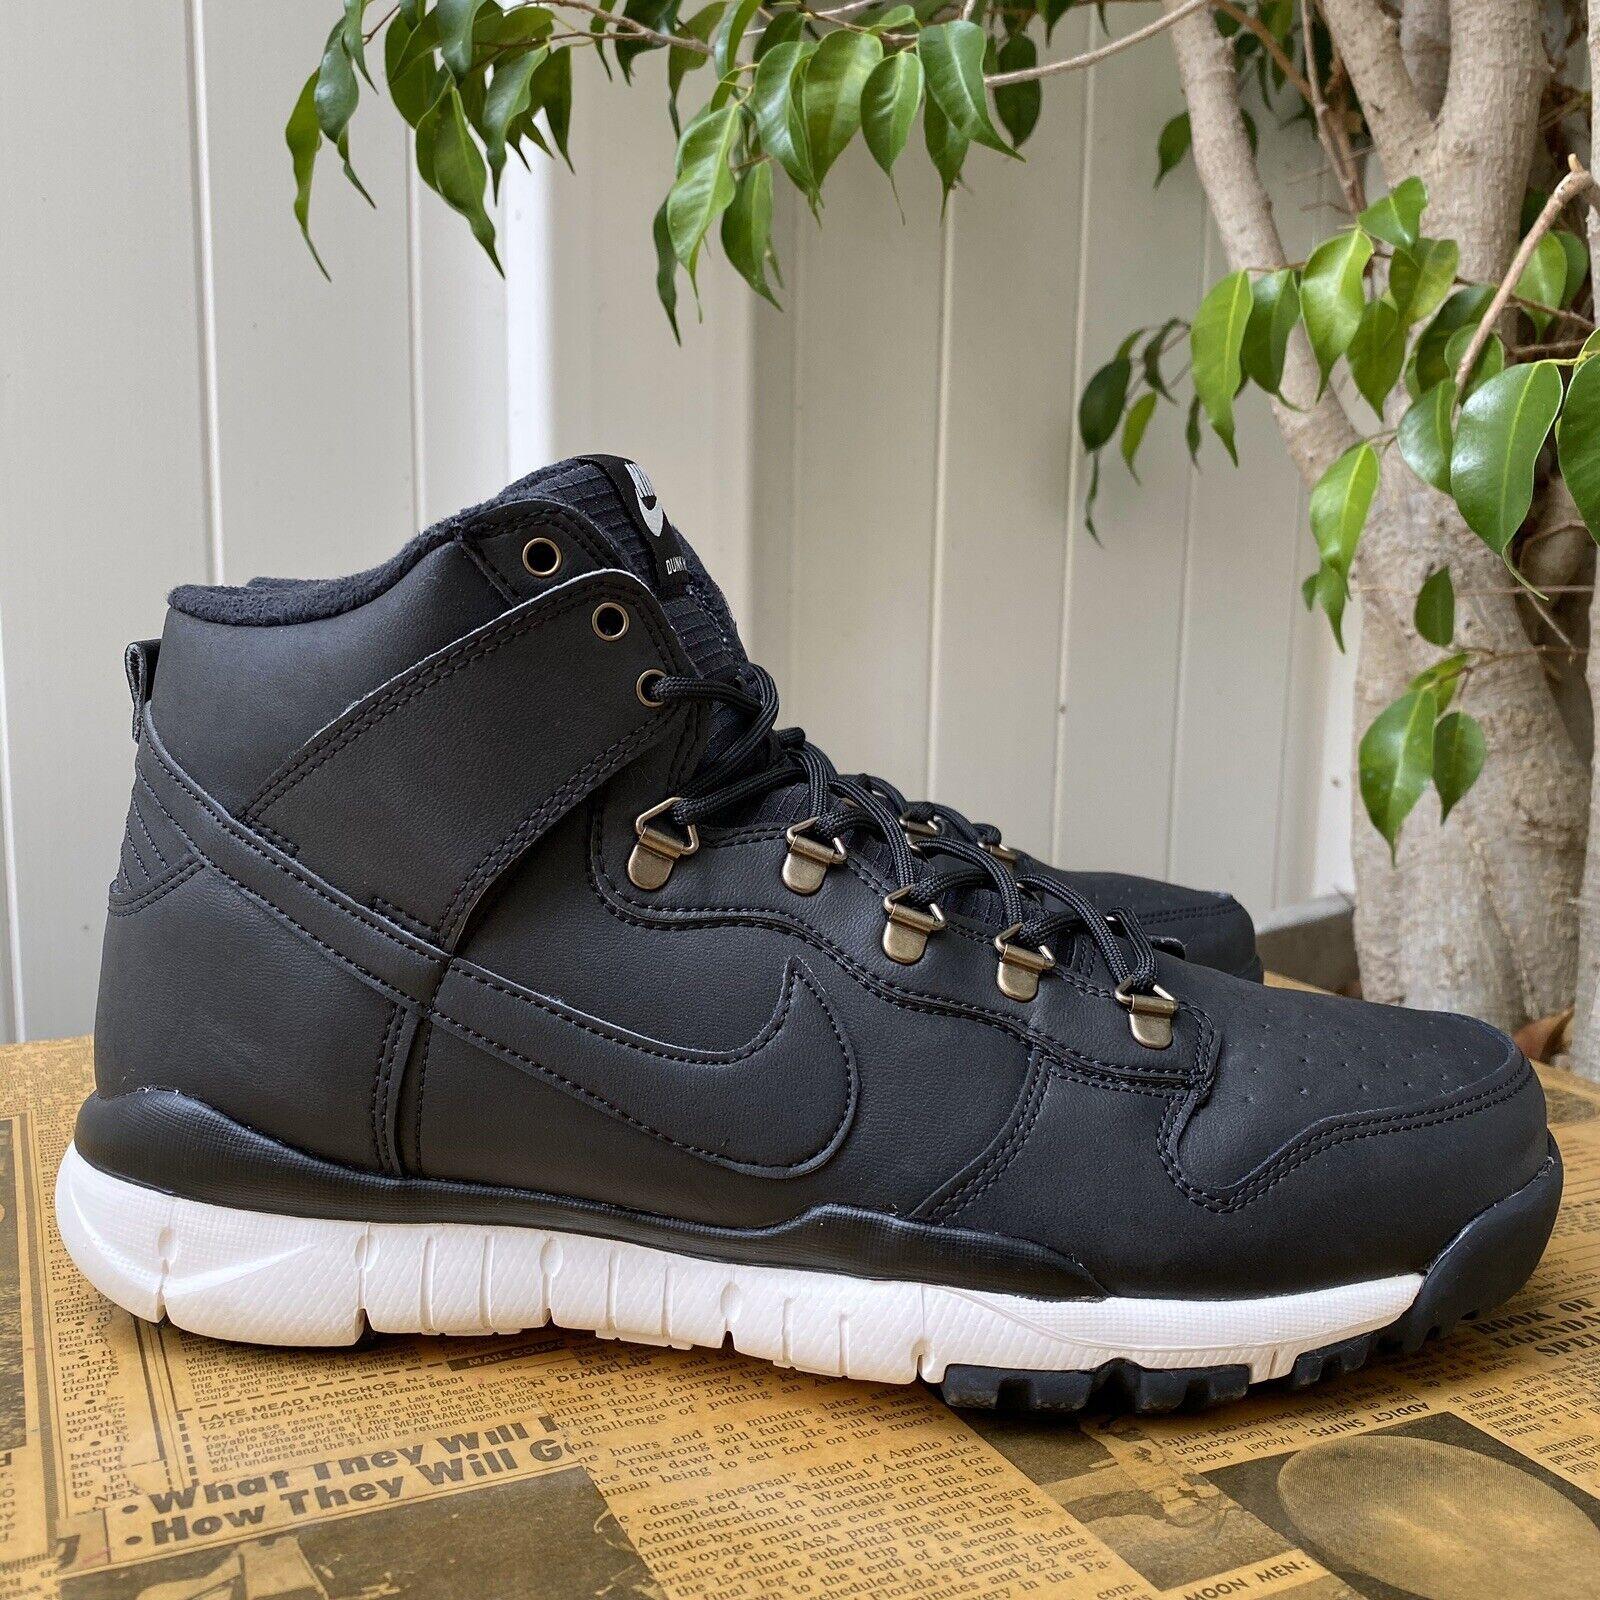 Nike SB Dunk High Boot UK 5.5 Black